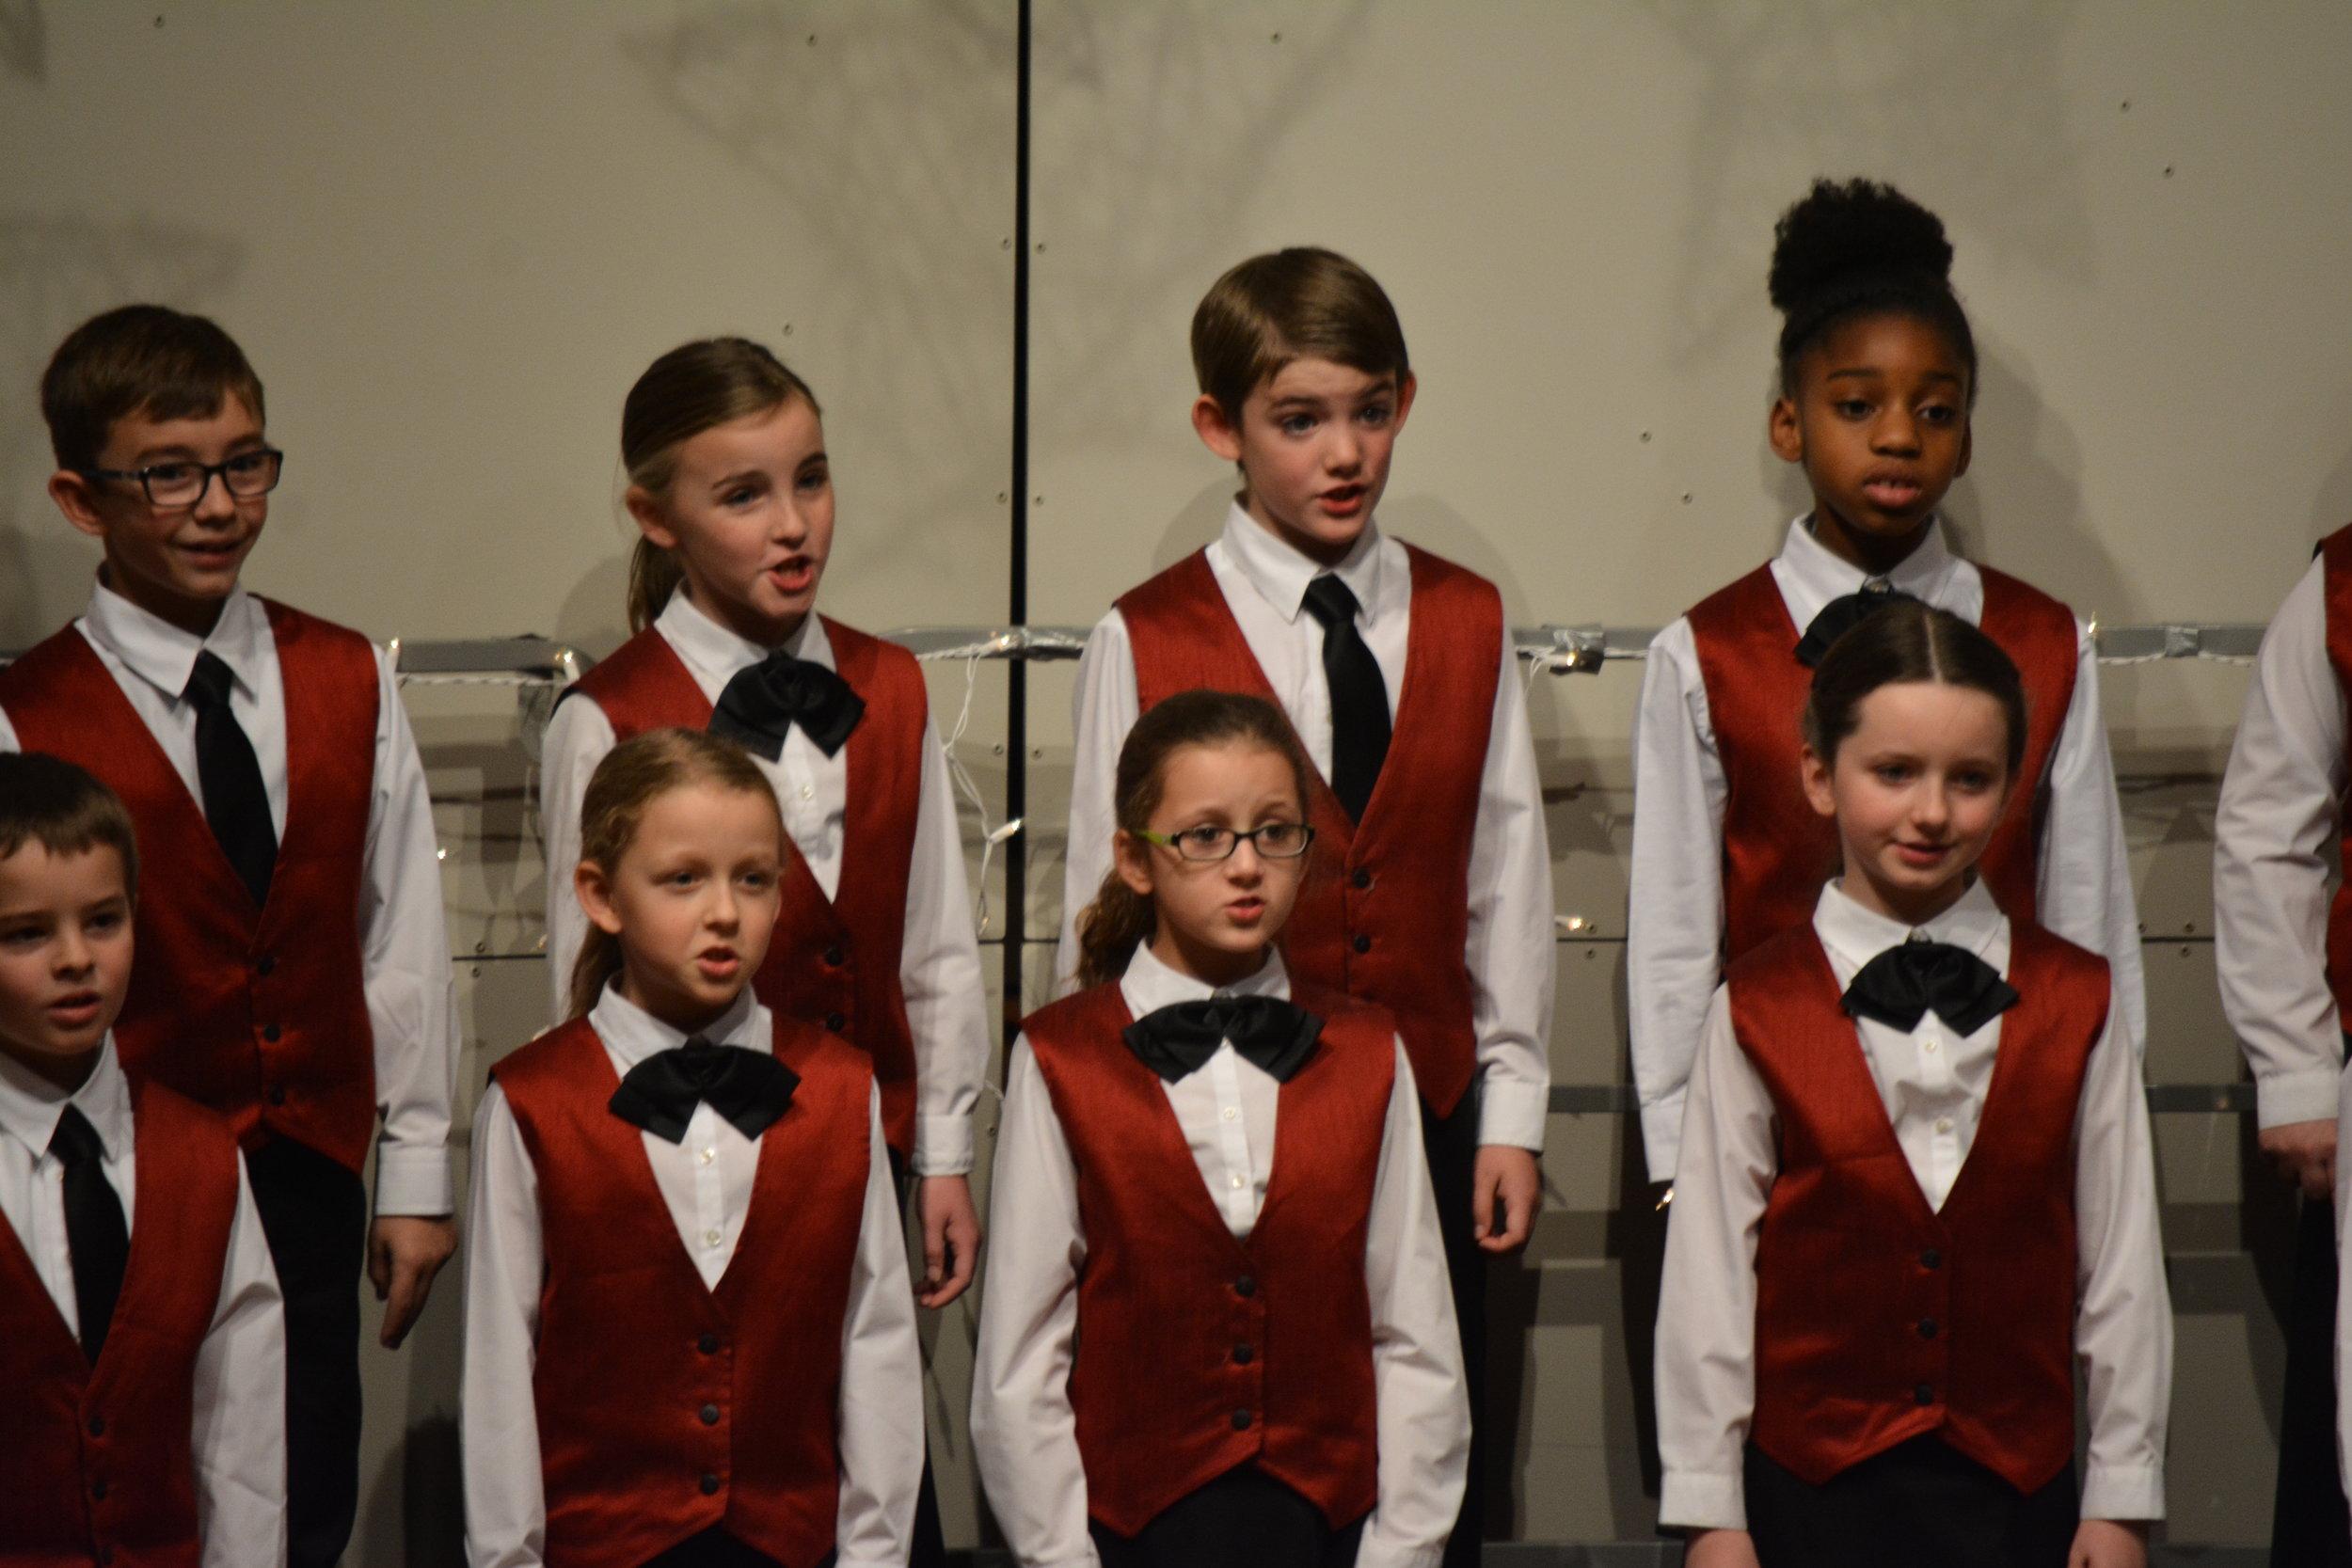 2016-12-04 Prep Choir 3 Singers 1.jpg